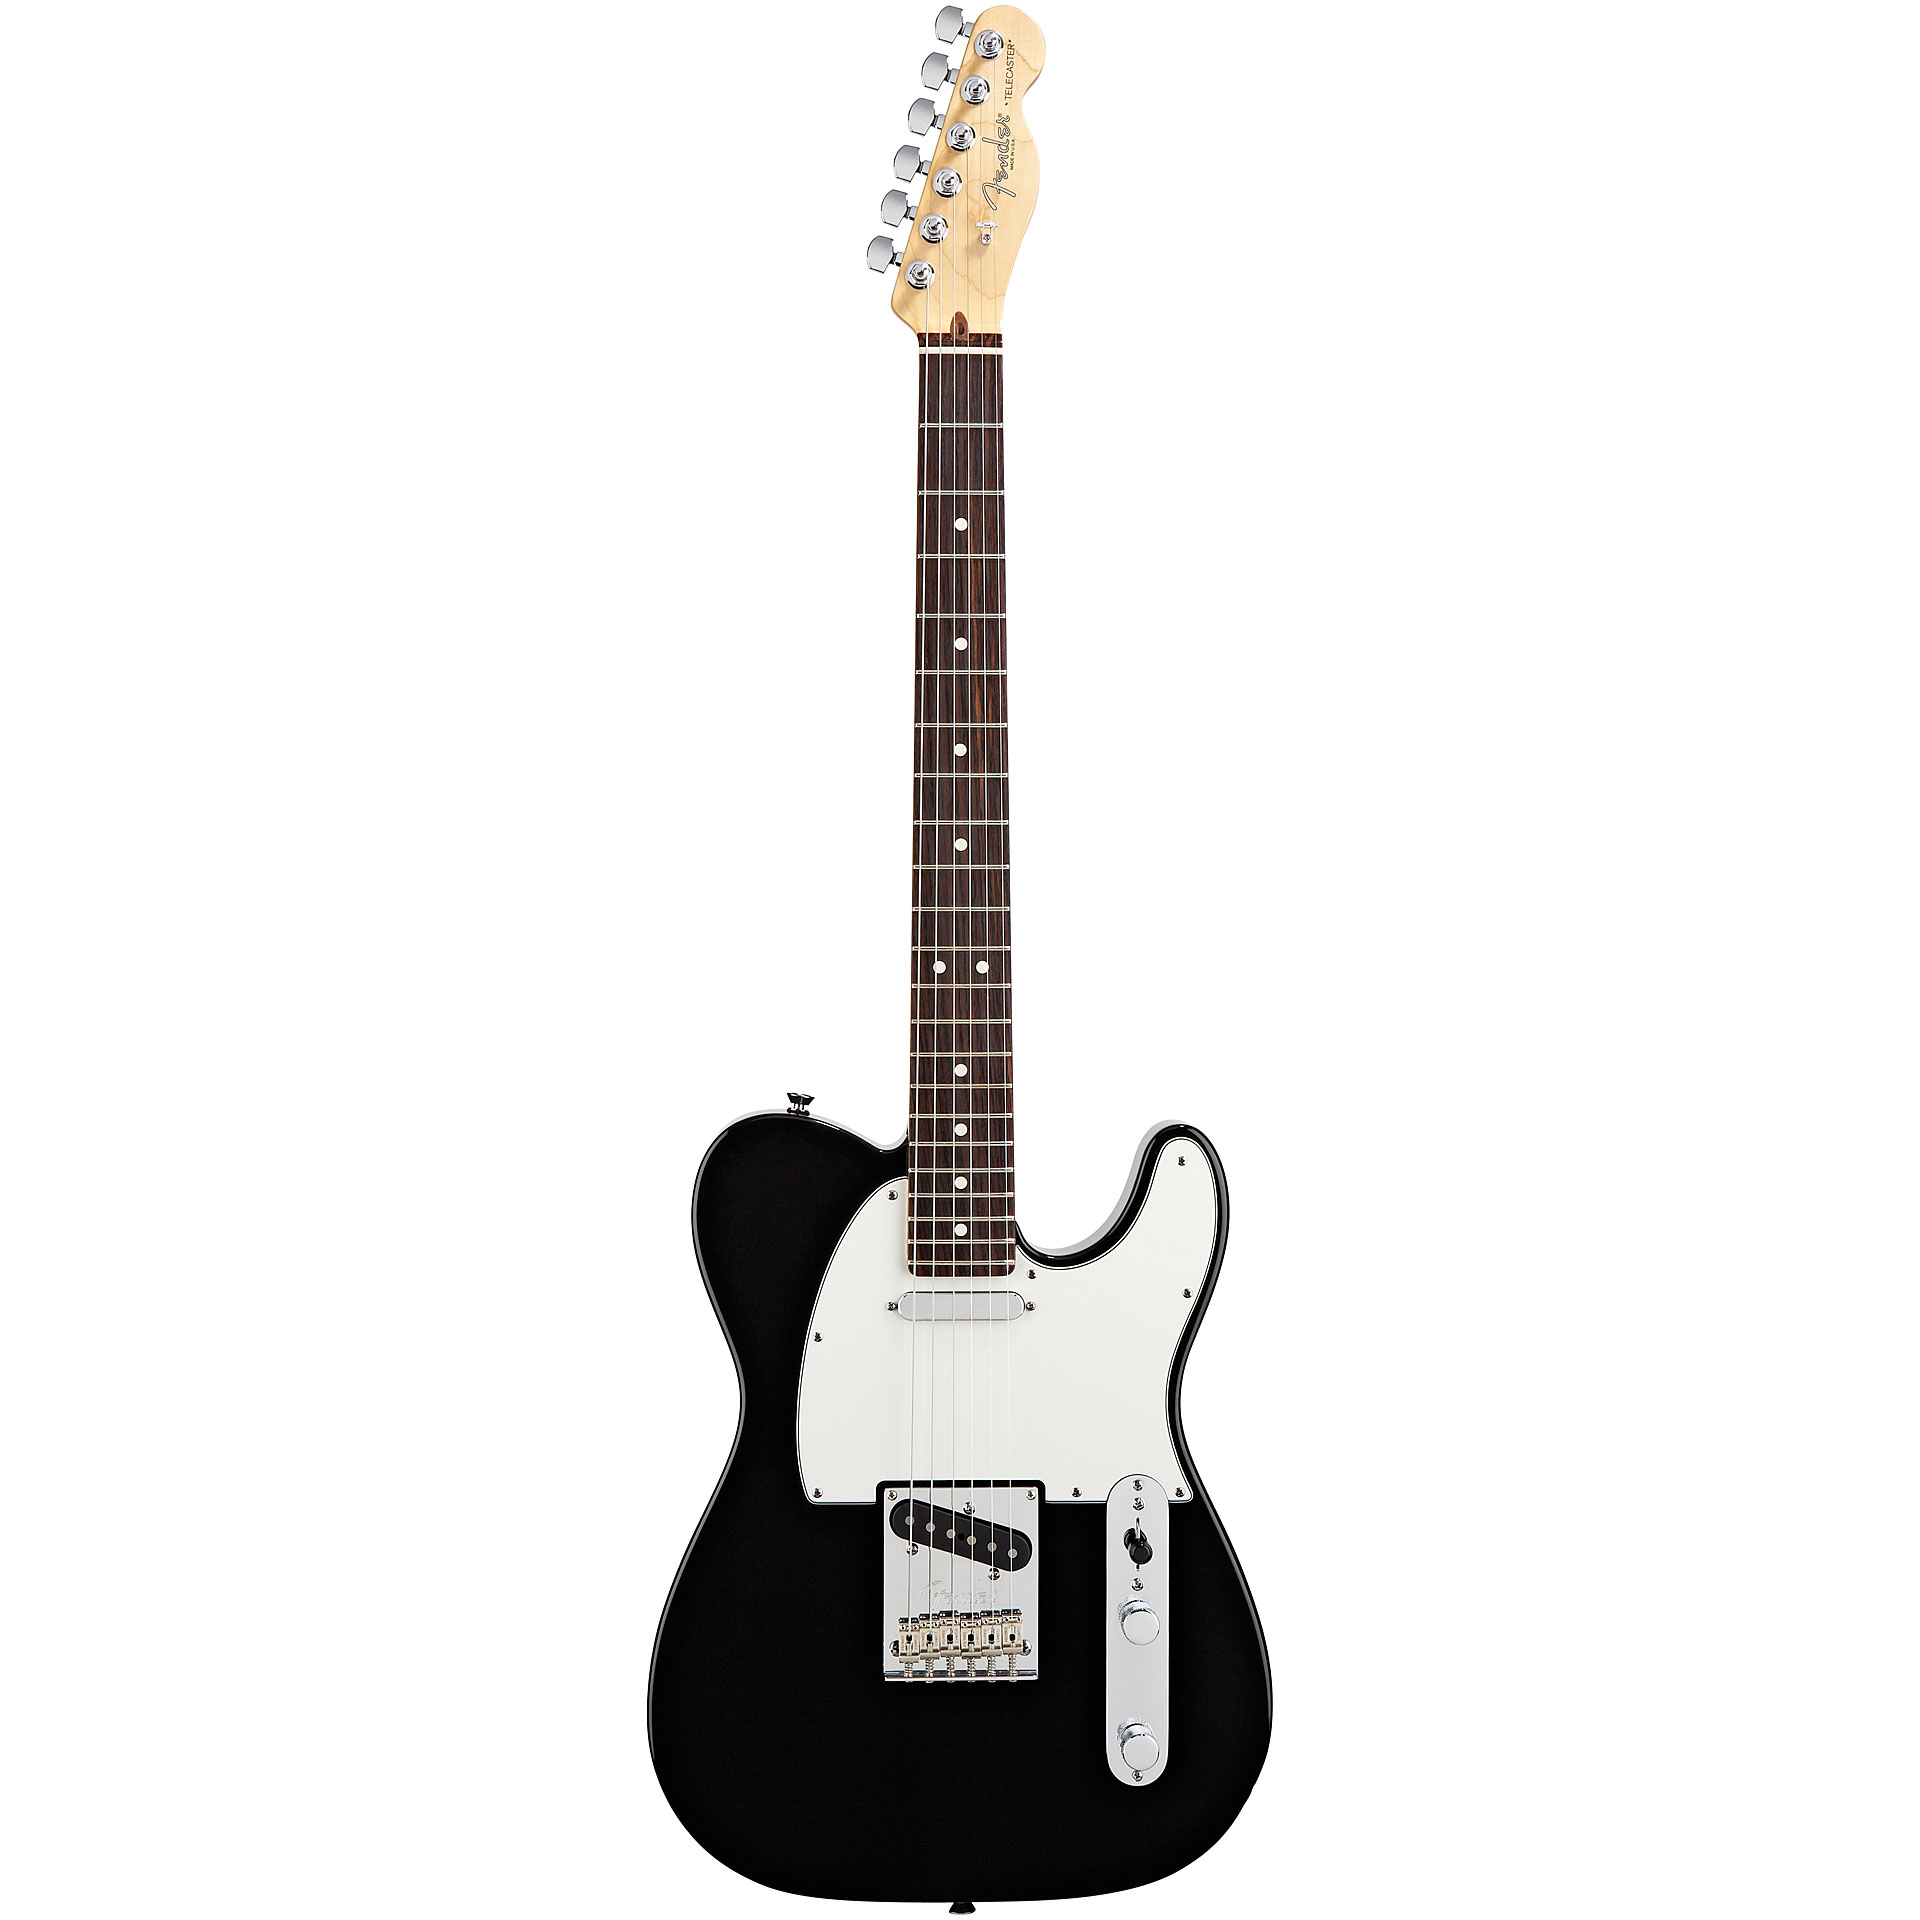 Fender american standard 2012 telecaster rw blk 171 electric guitar